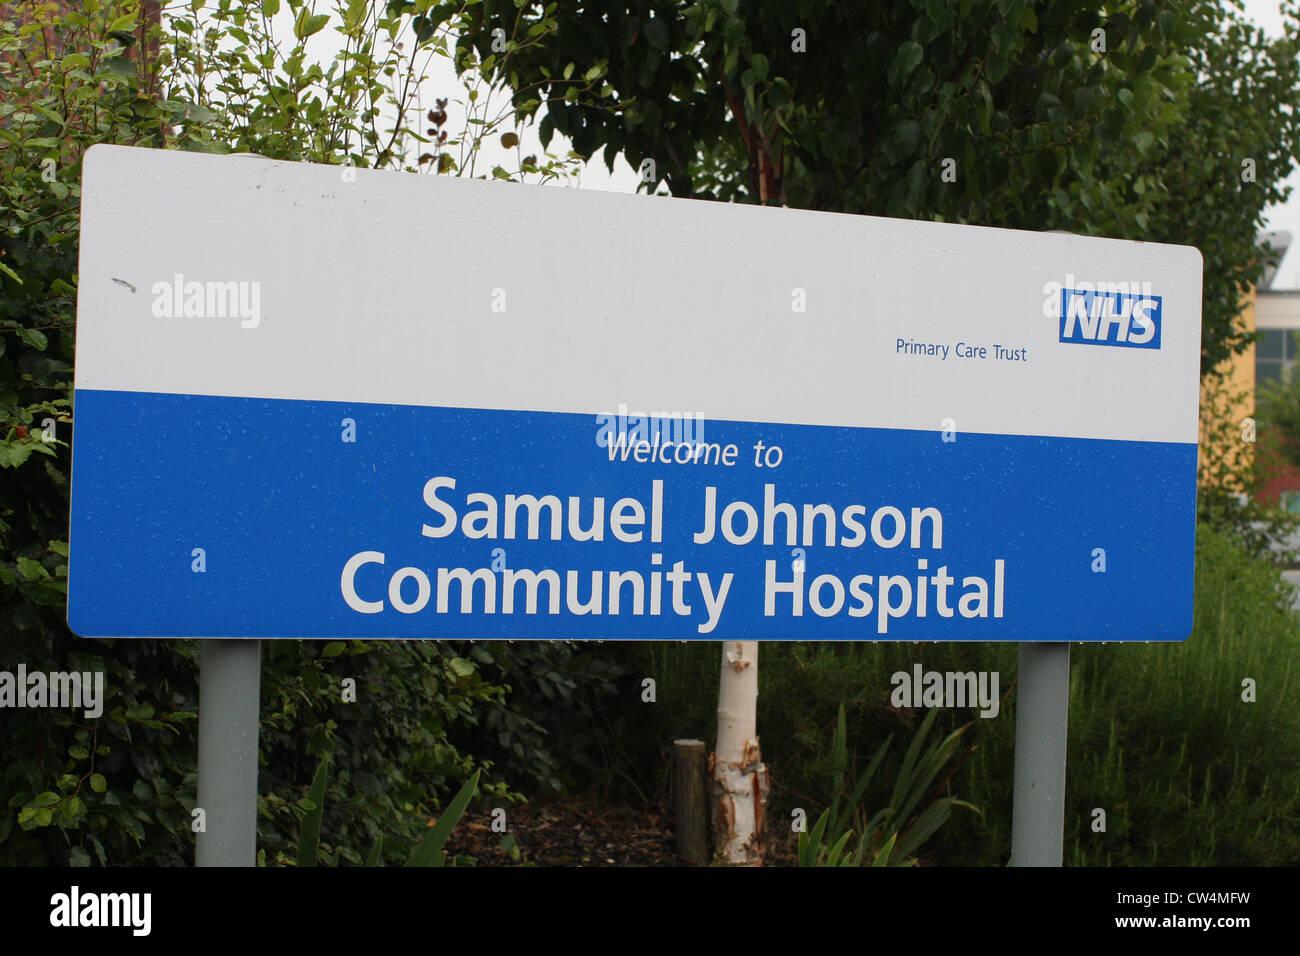 Samuel Johnson Community Hospital signage, Lichfield ,Staffordshire - Stock Image